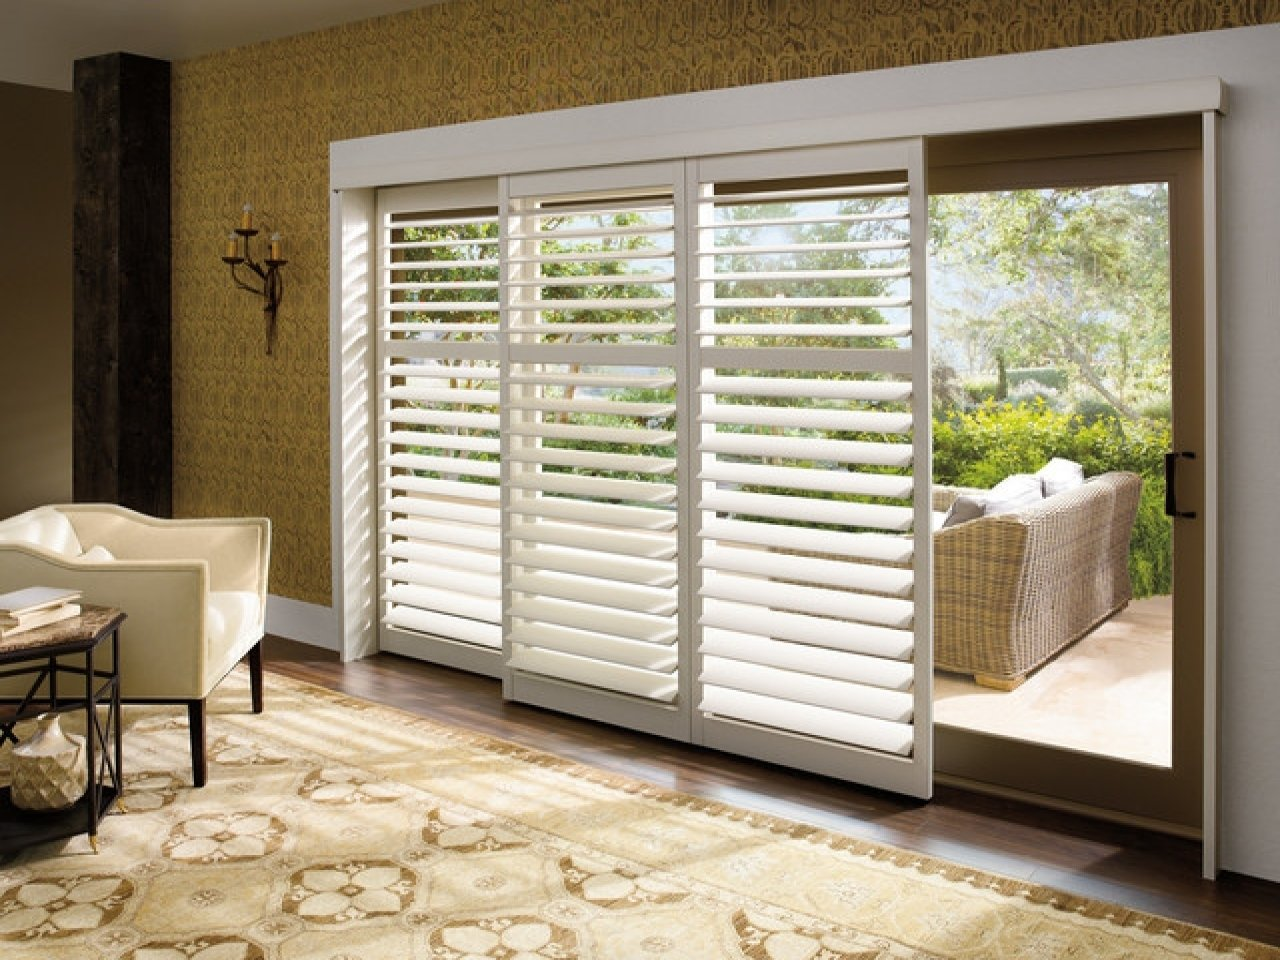 10 Wonderful Window Treatment Ideas For Sliding Glass Doors window treatments for sliding glass doors ideas tips 2 2020